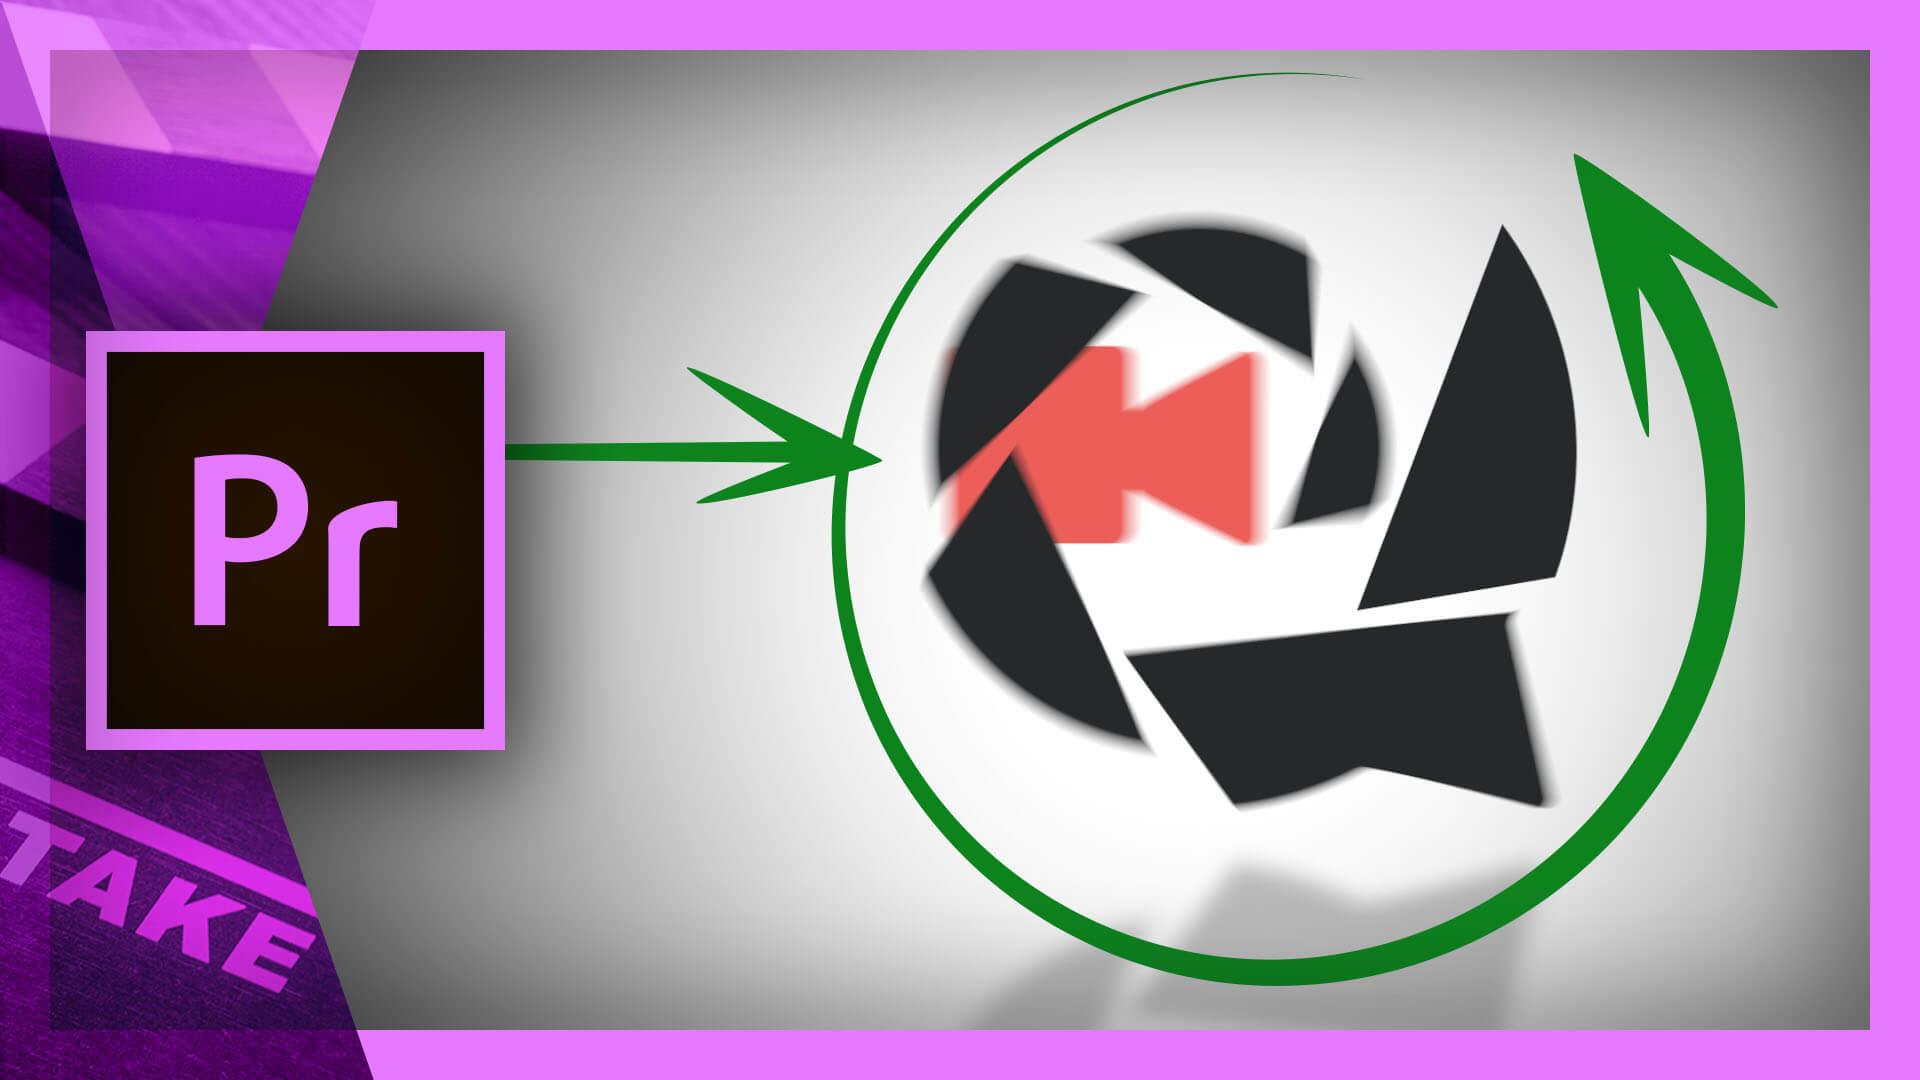 Modern Logo Animation in Adobe Premiere Pro | Cinecom net